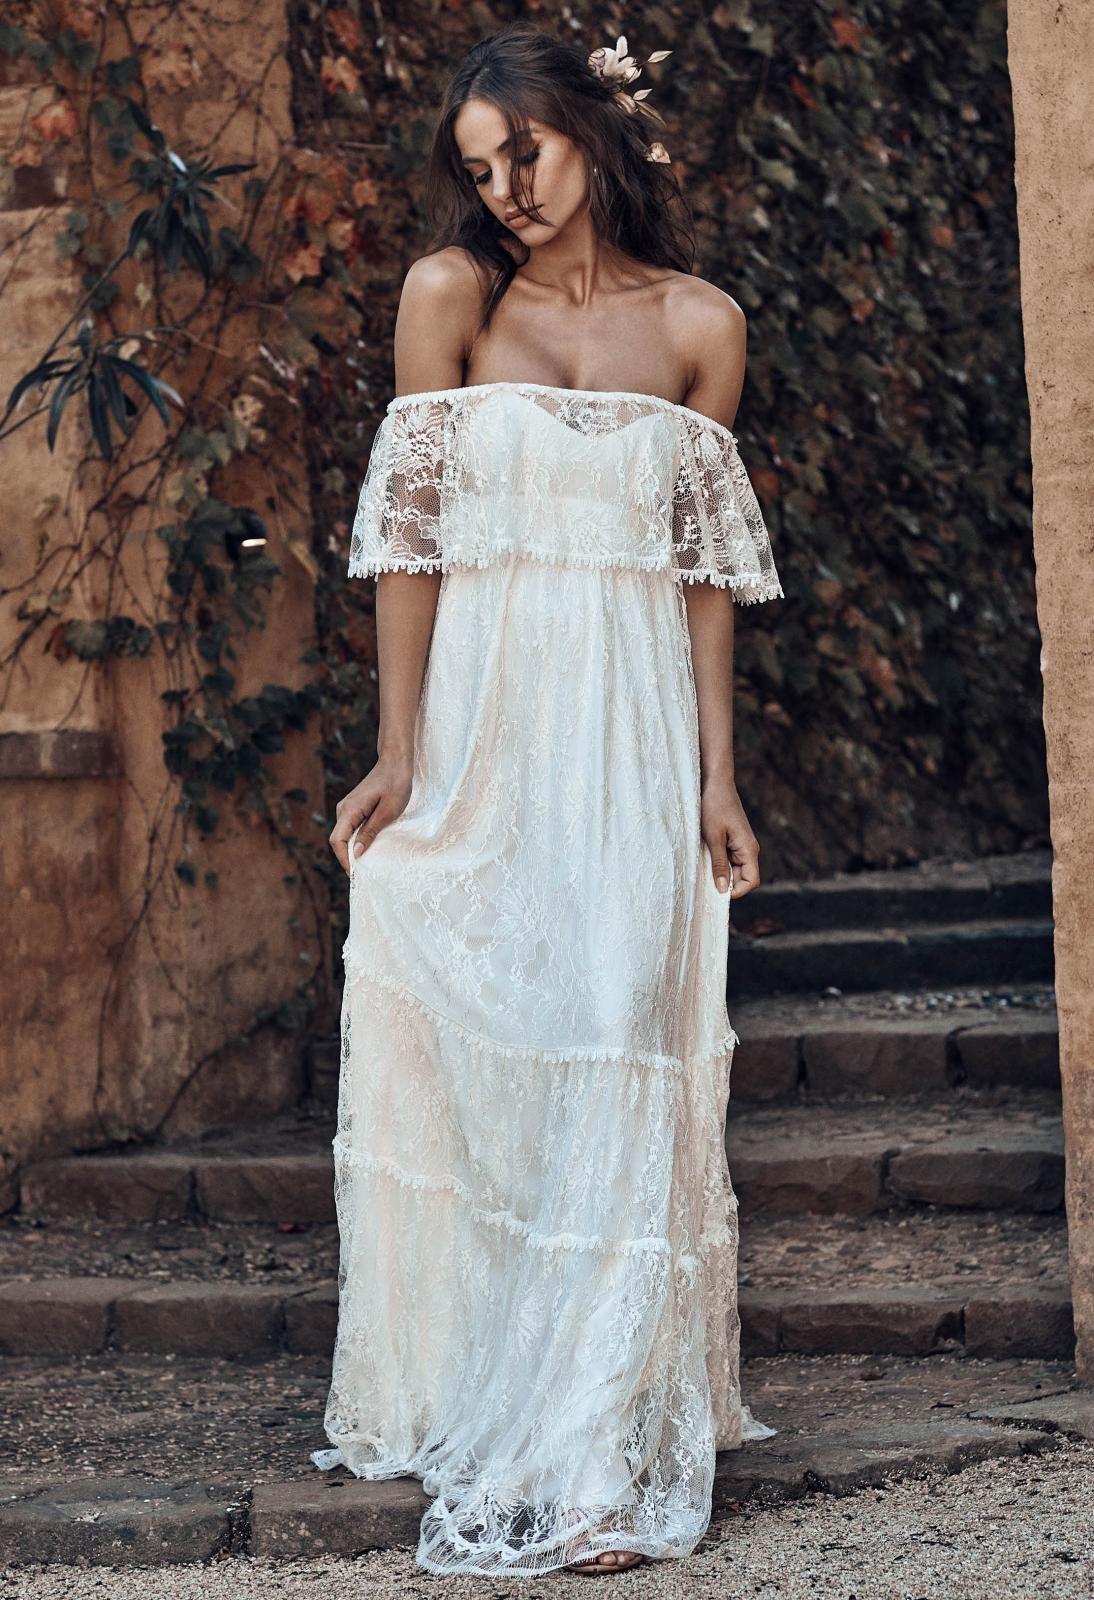 Off the shoulder bohemian wedding dress  Franca  BOHEMIAN BRIDE  Pinterest  Wedding Bridal dresses and